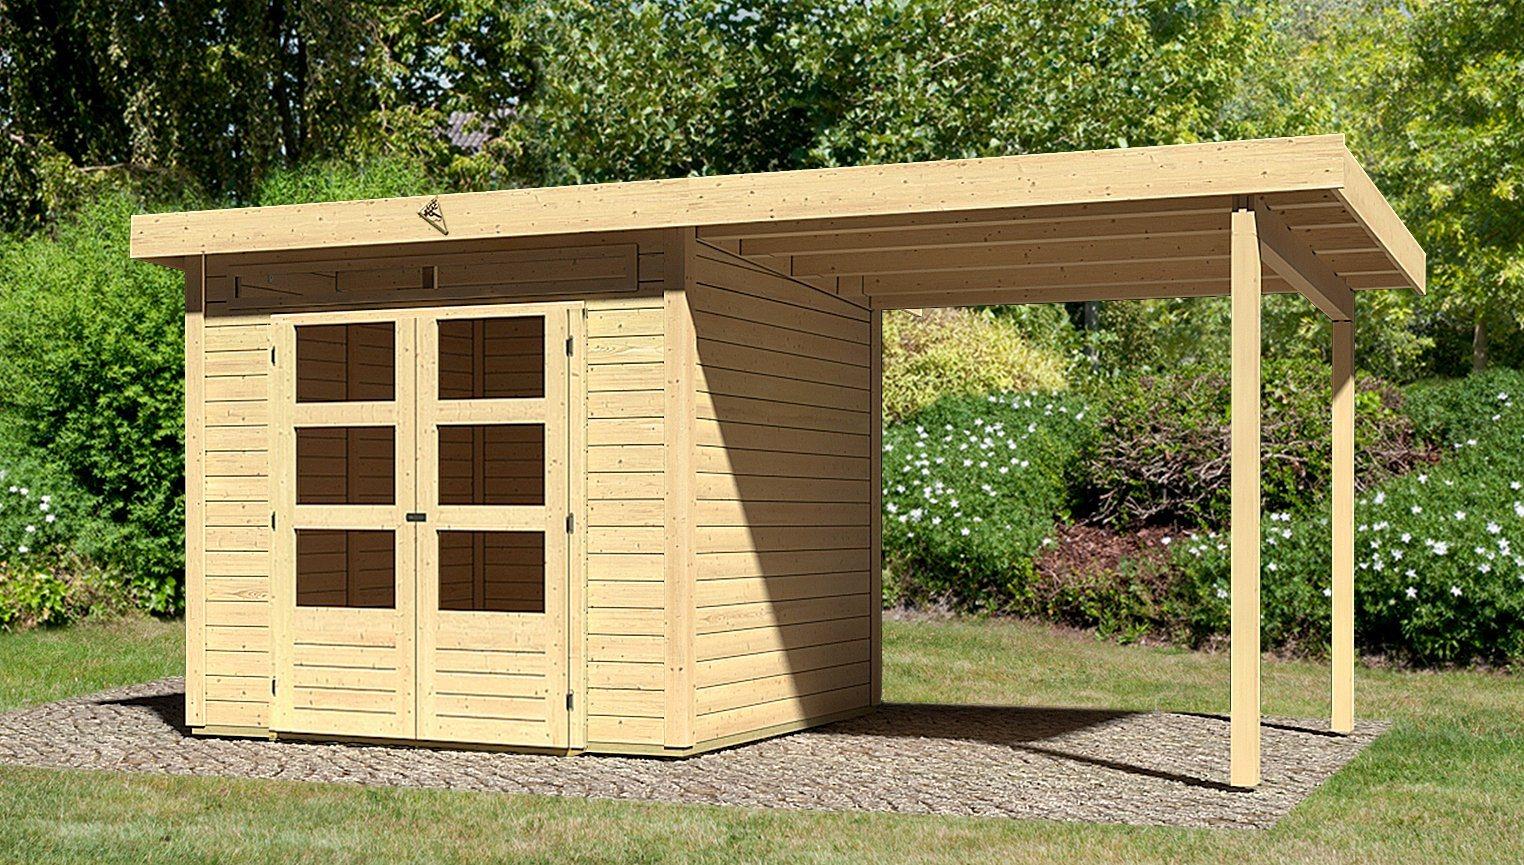 KARIBU Set: Gartenhaus »Kandern 3«, BxT: 522x273 cm, inkl. Anbaudach | Garten > Gartenhäuser | Karibu